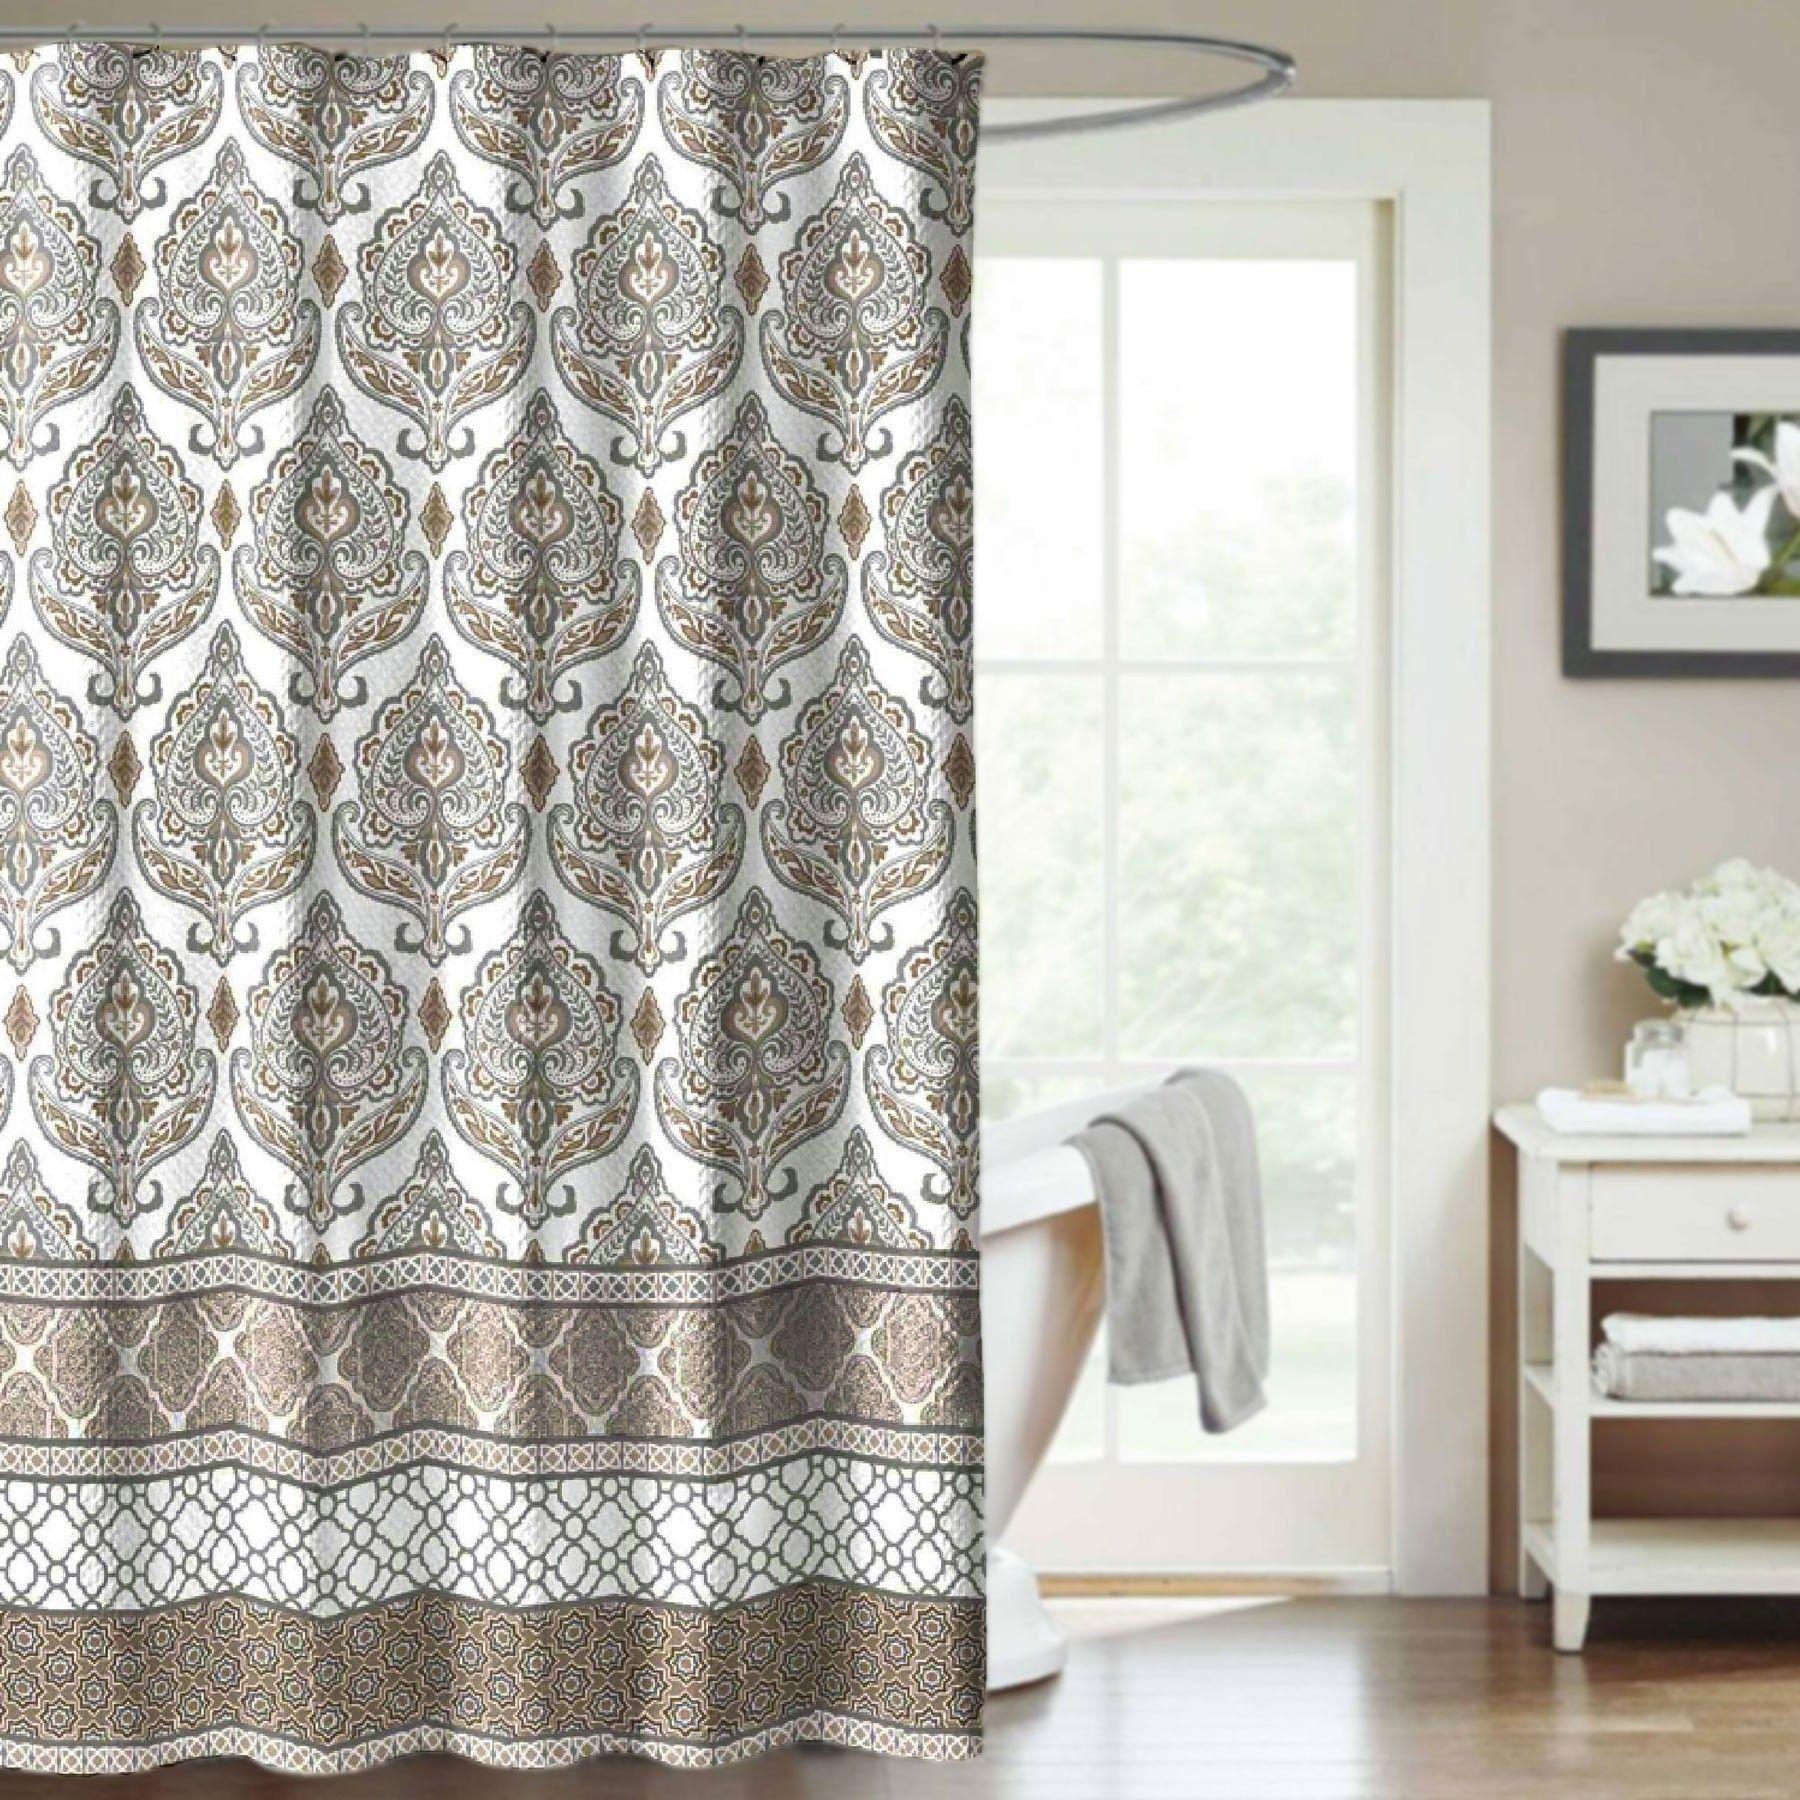 Update The Look Of Your Bathroom With Crest Home S Darien Shower